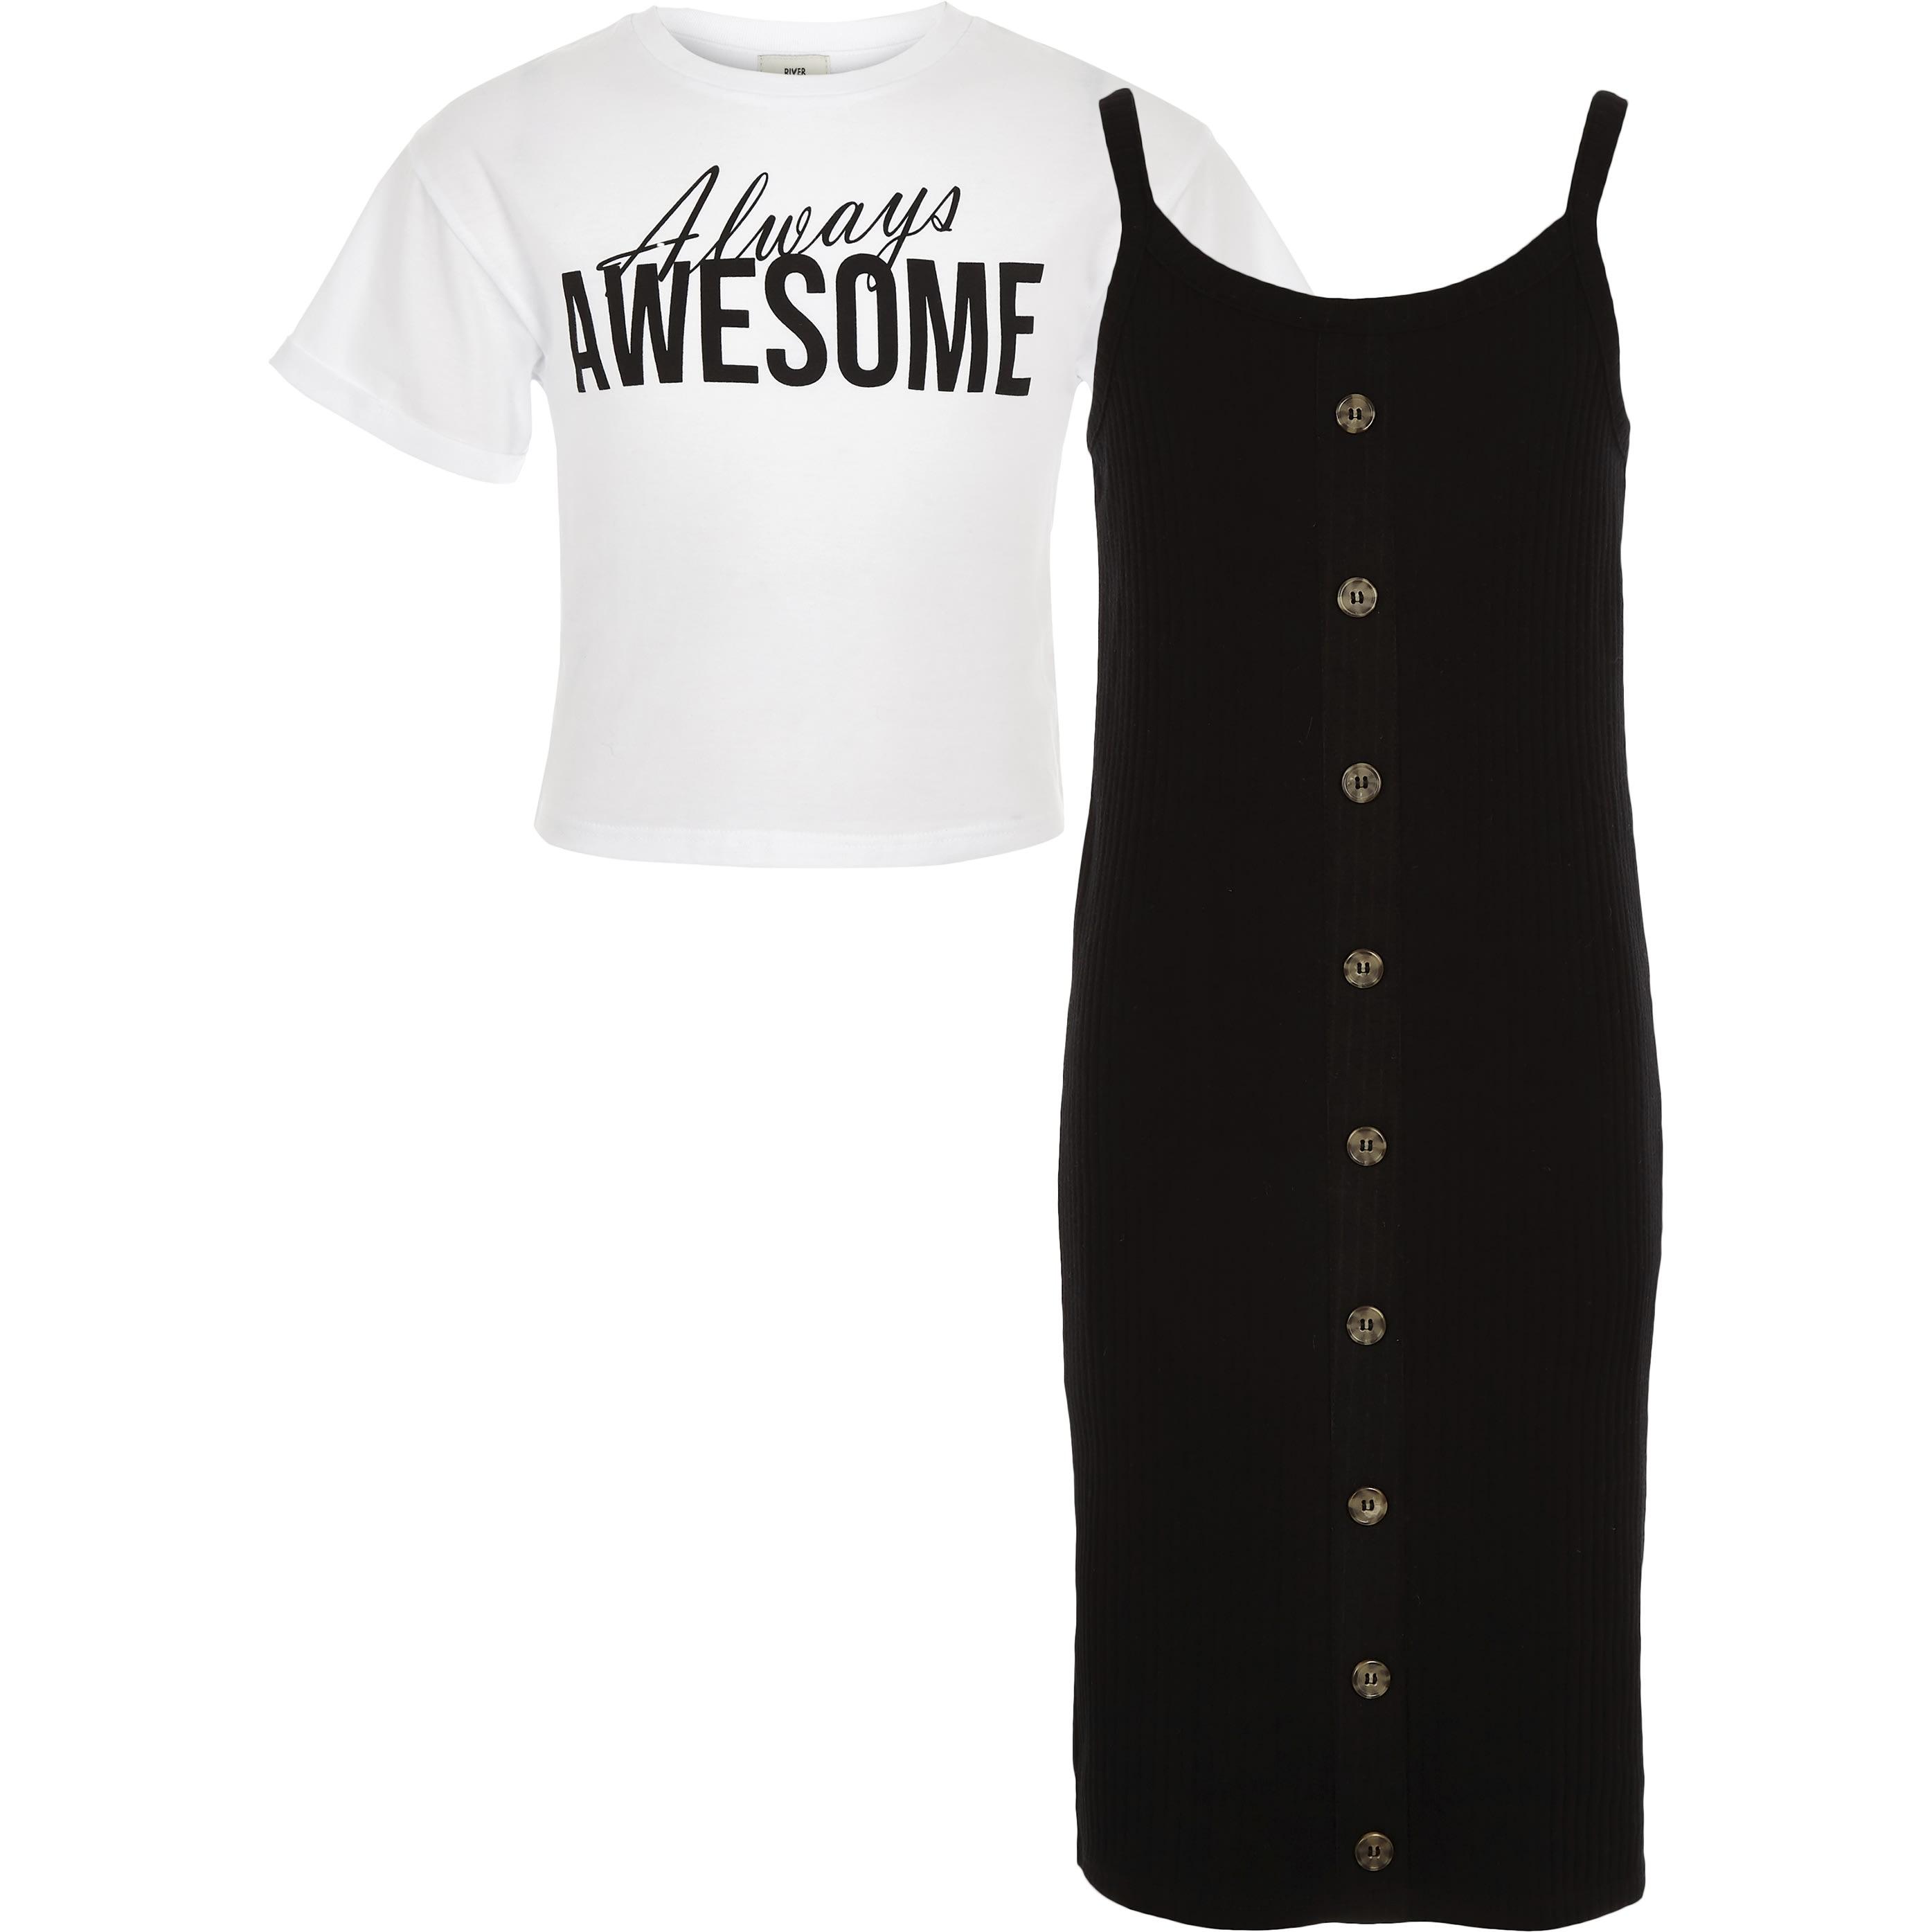 River Island Girls Black 2 in 1 T-shirt dress (11-12 Yrs)